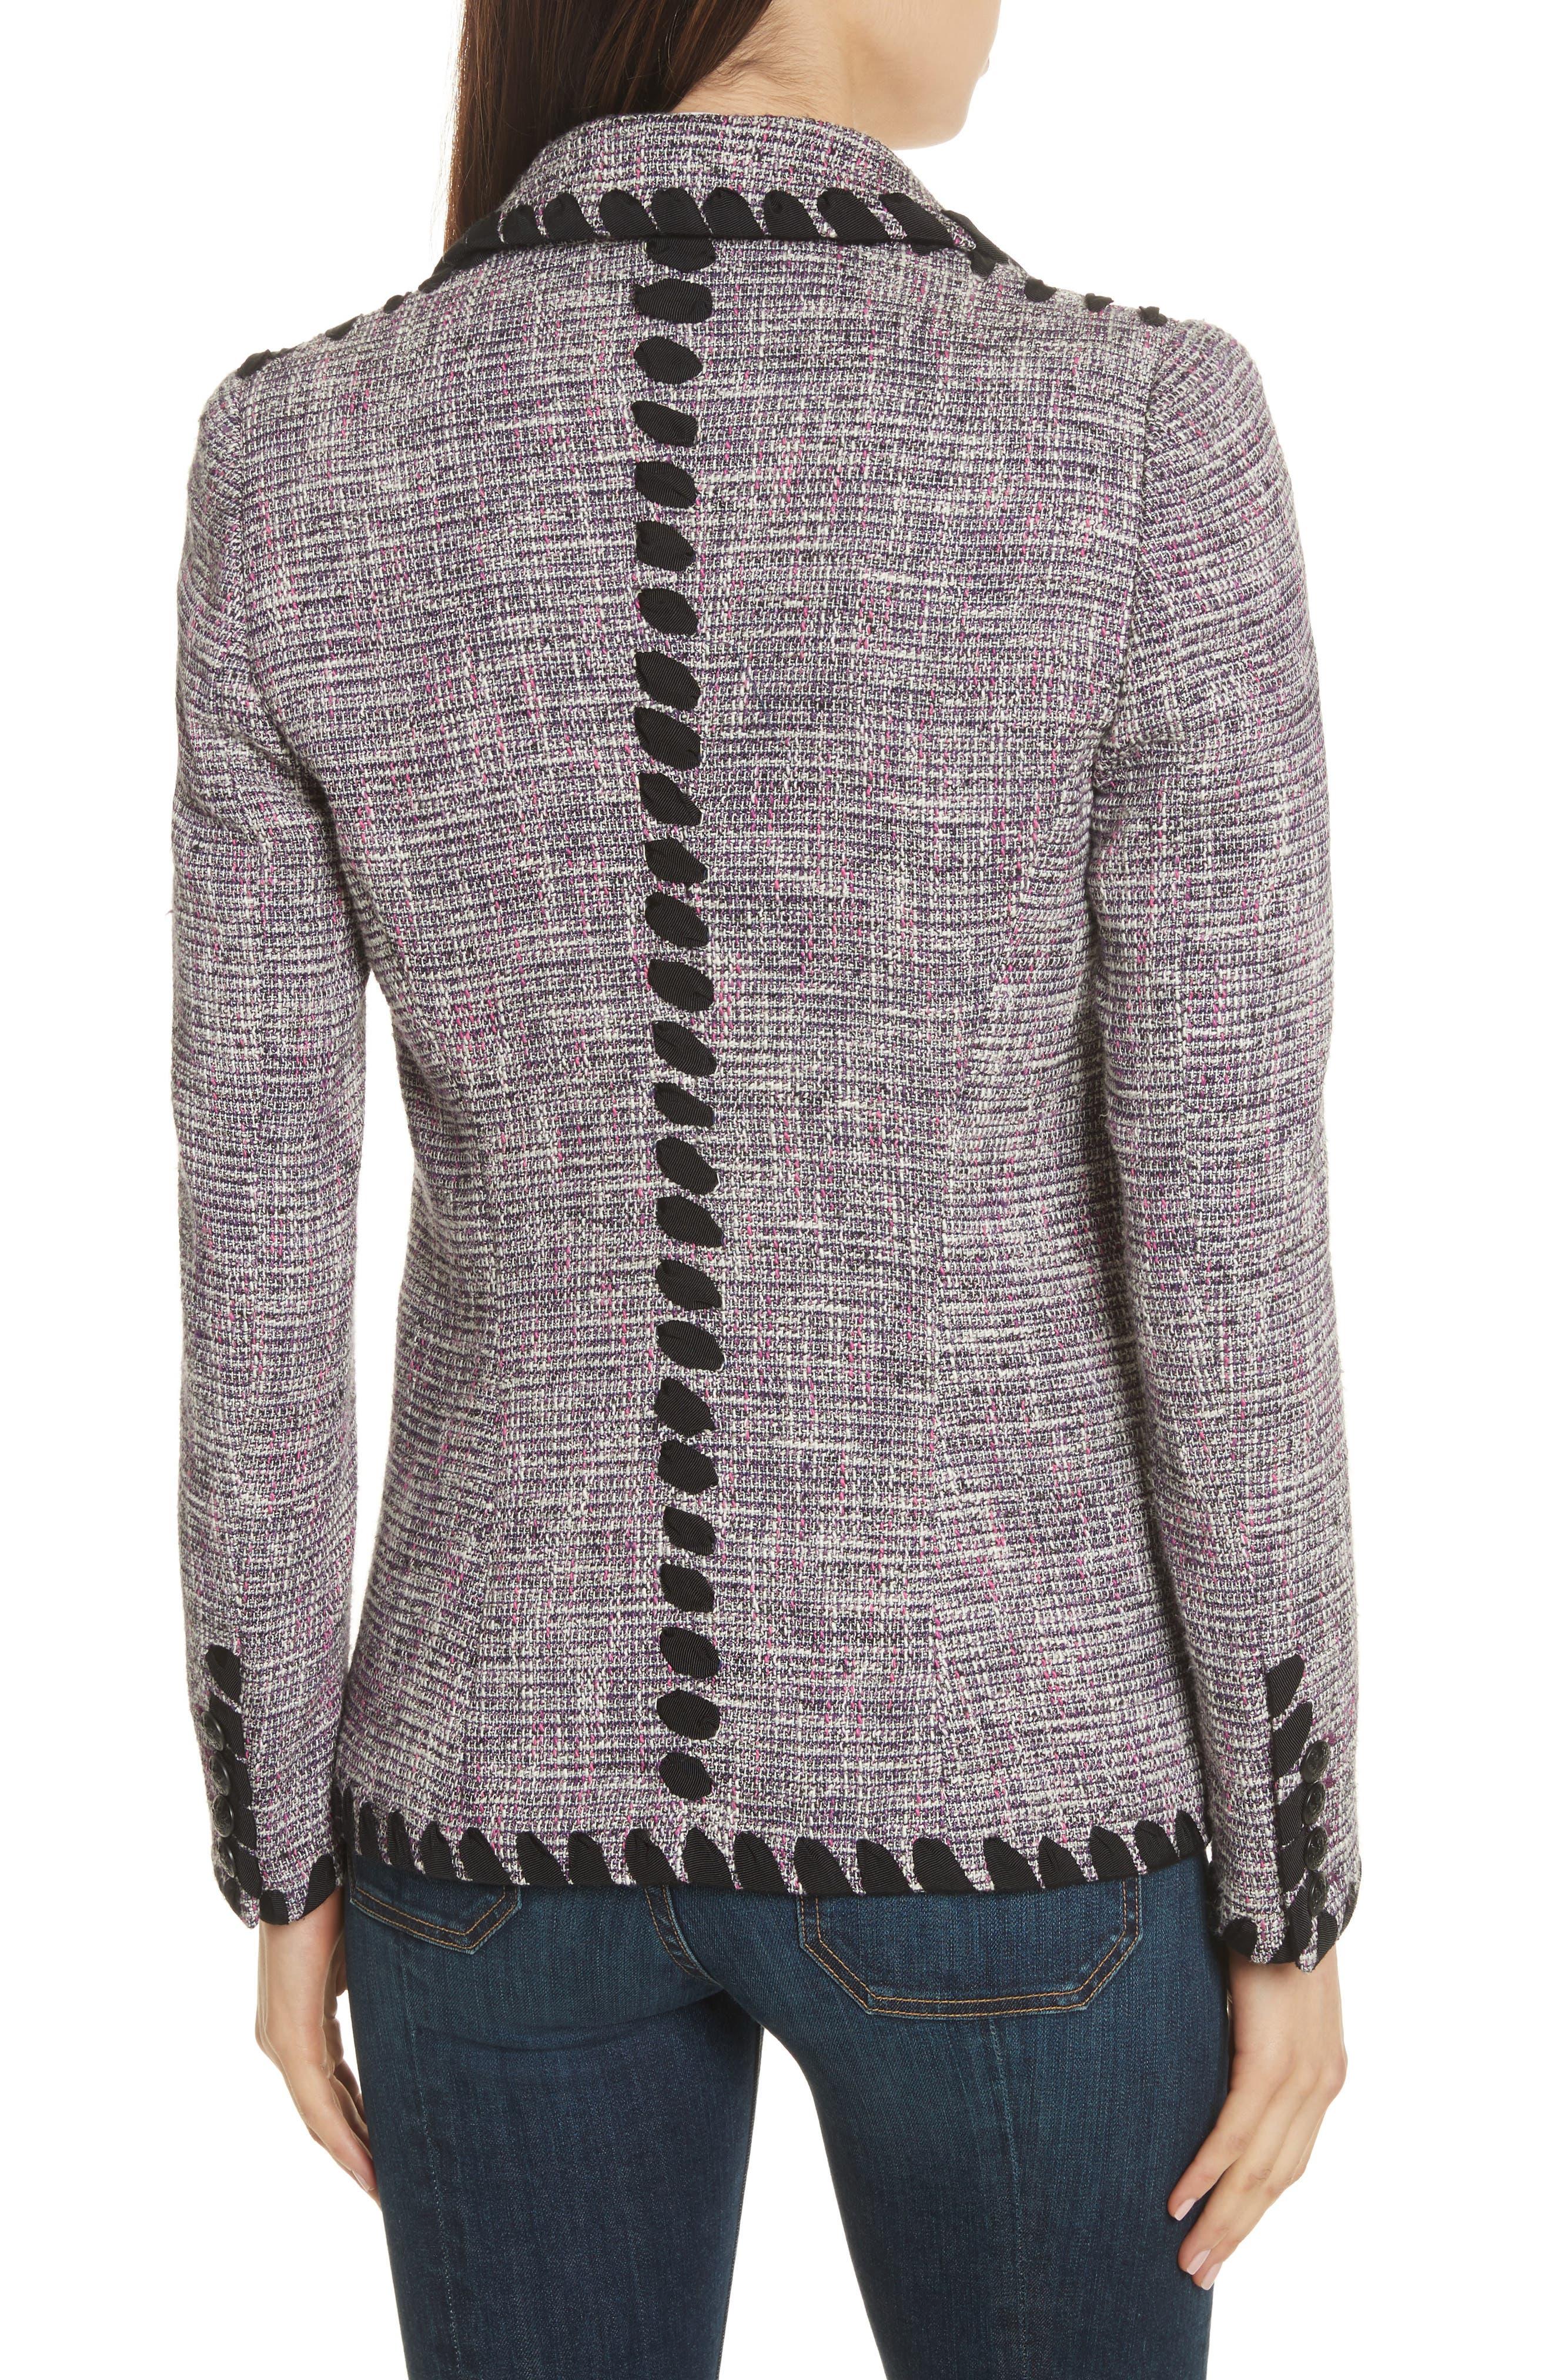 Octivia Tweed Blazer,                             Alternate thumbnail 2, color,                             Pink/ Black/ White